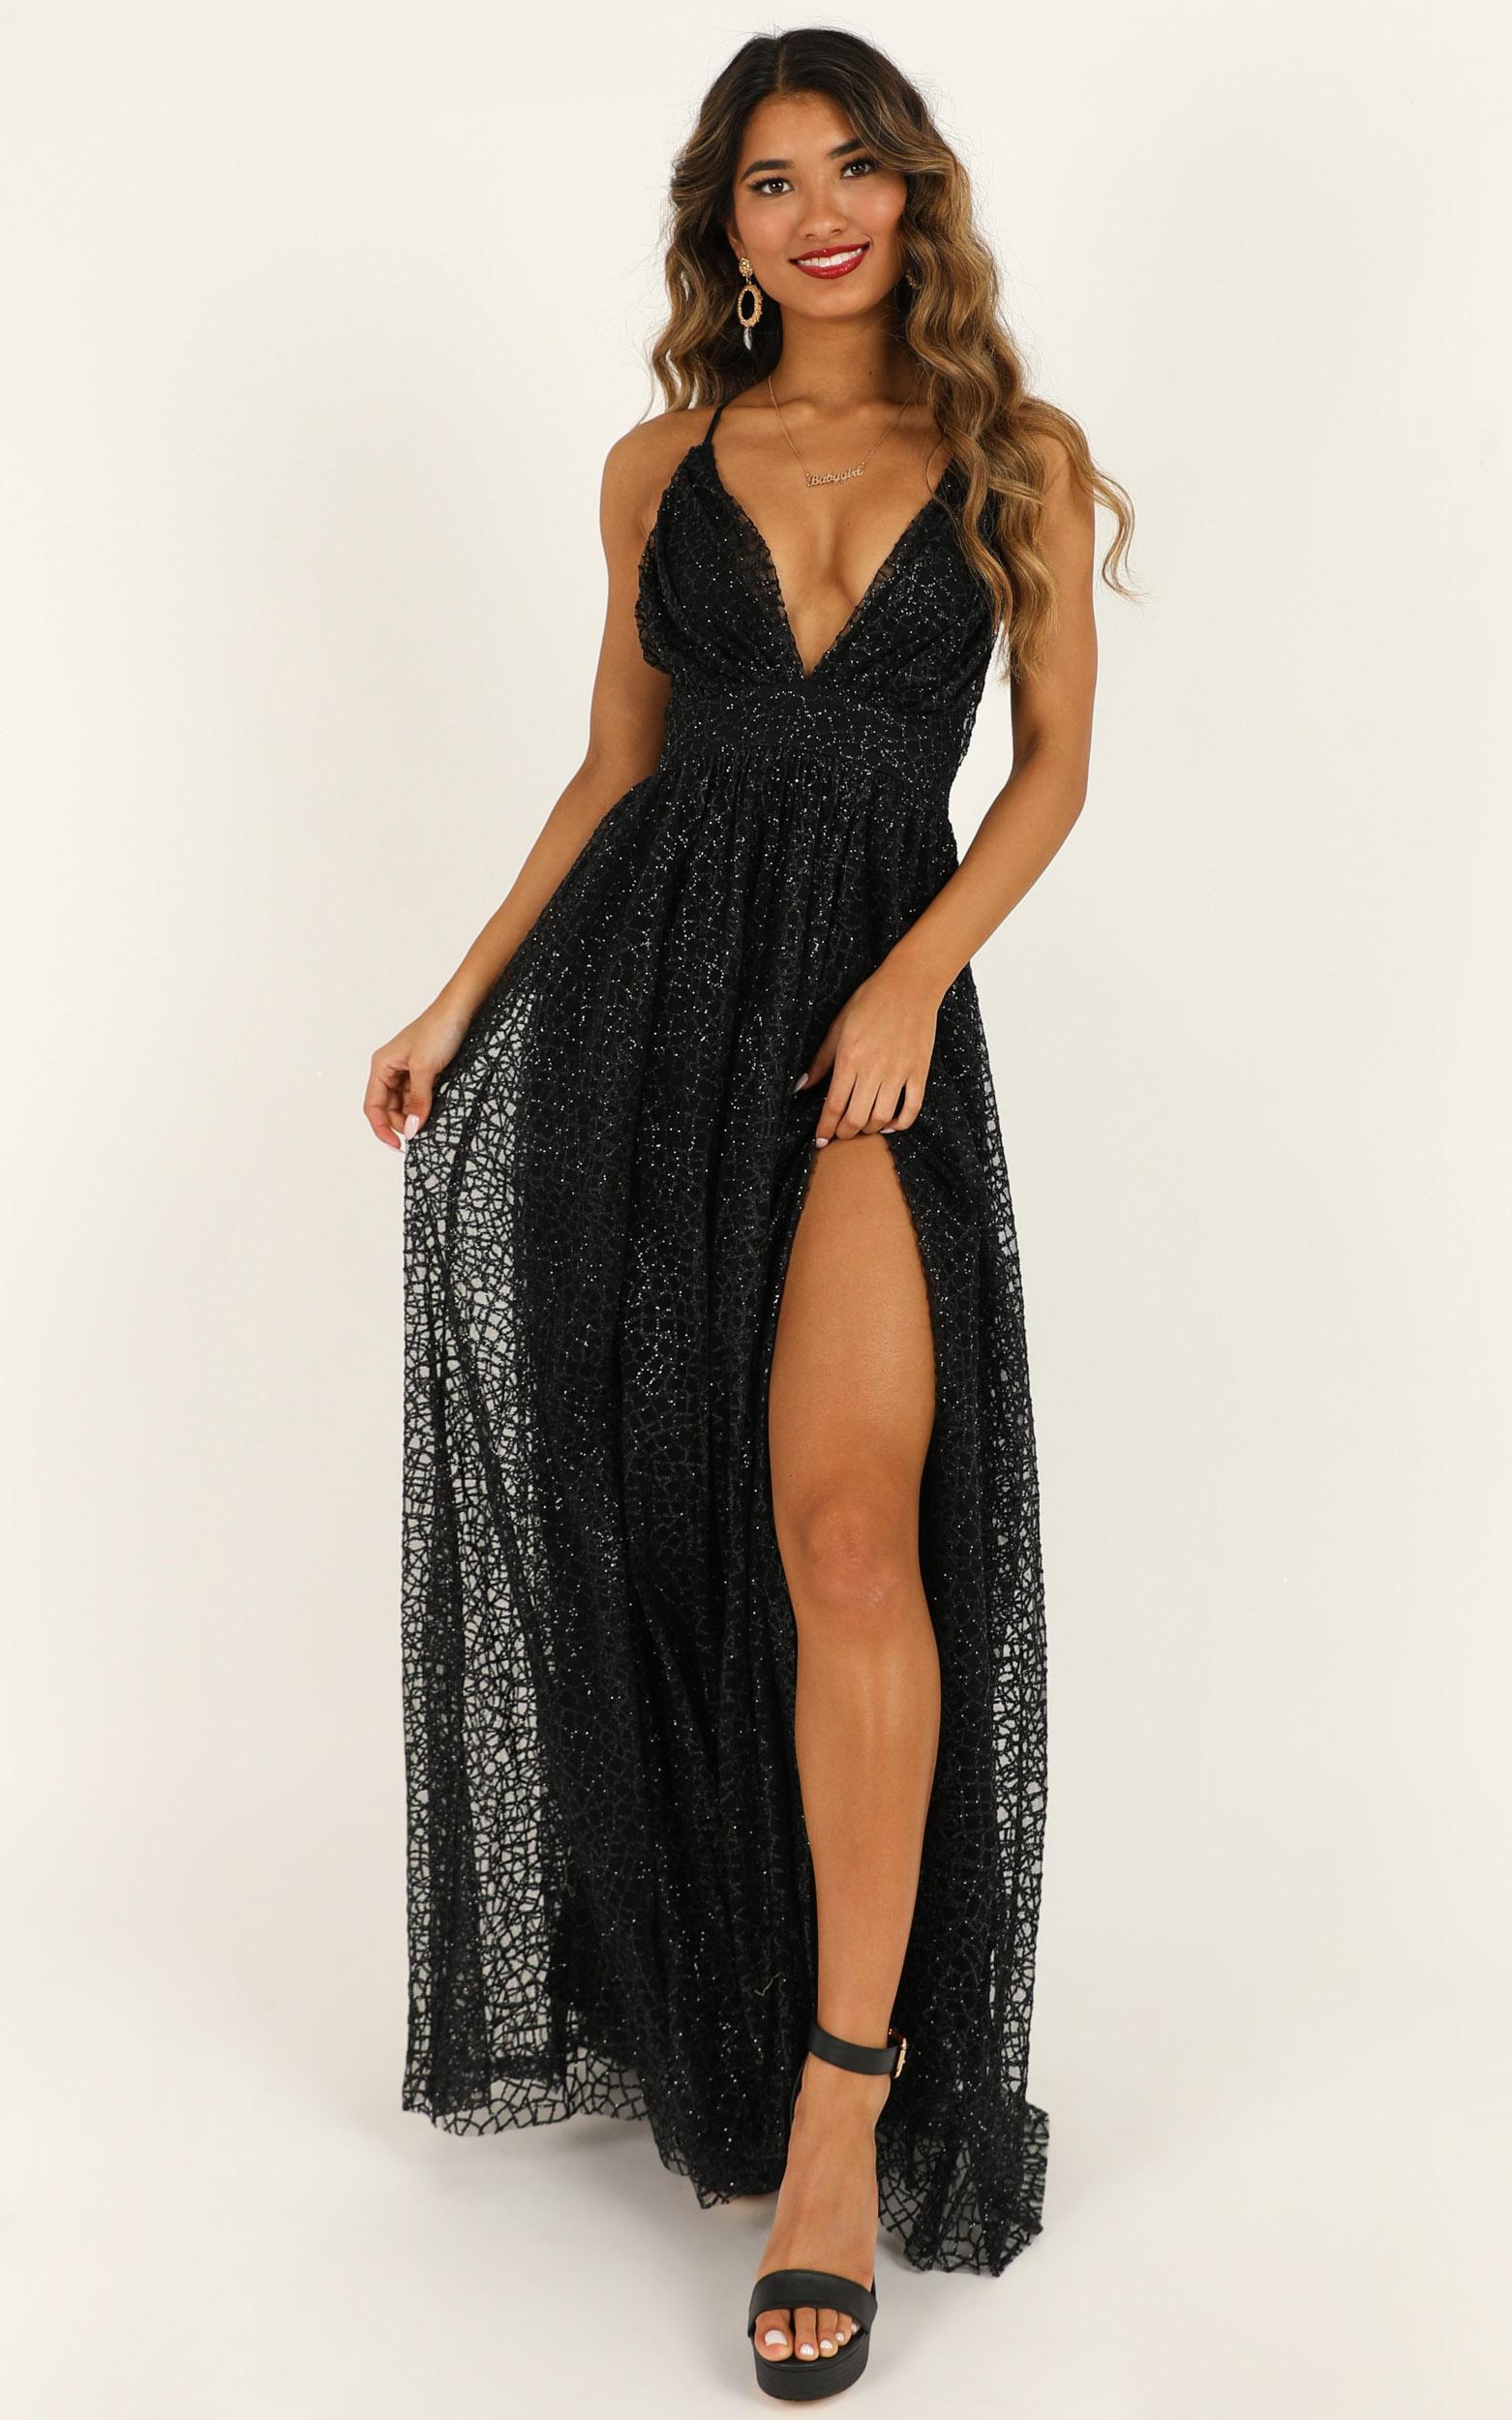 Lady Godiva Dress In Black Glitter - 4 (XXS), Black, hi-res image number null